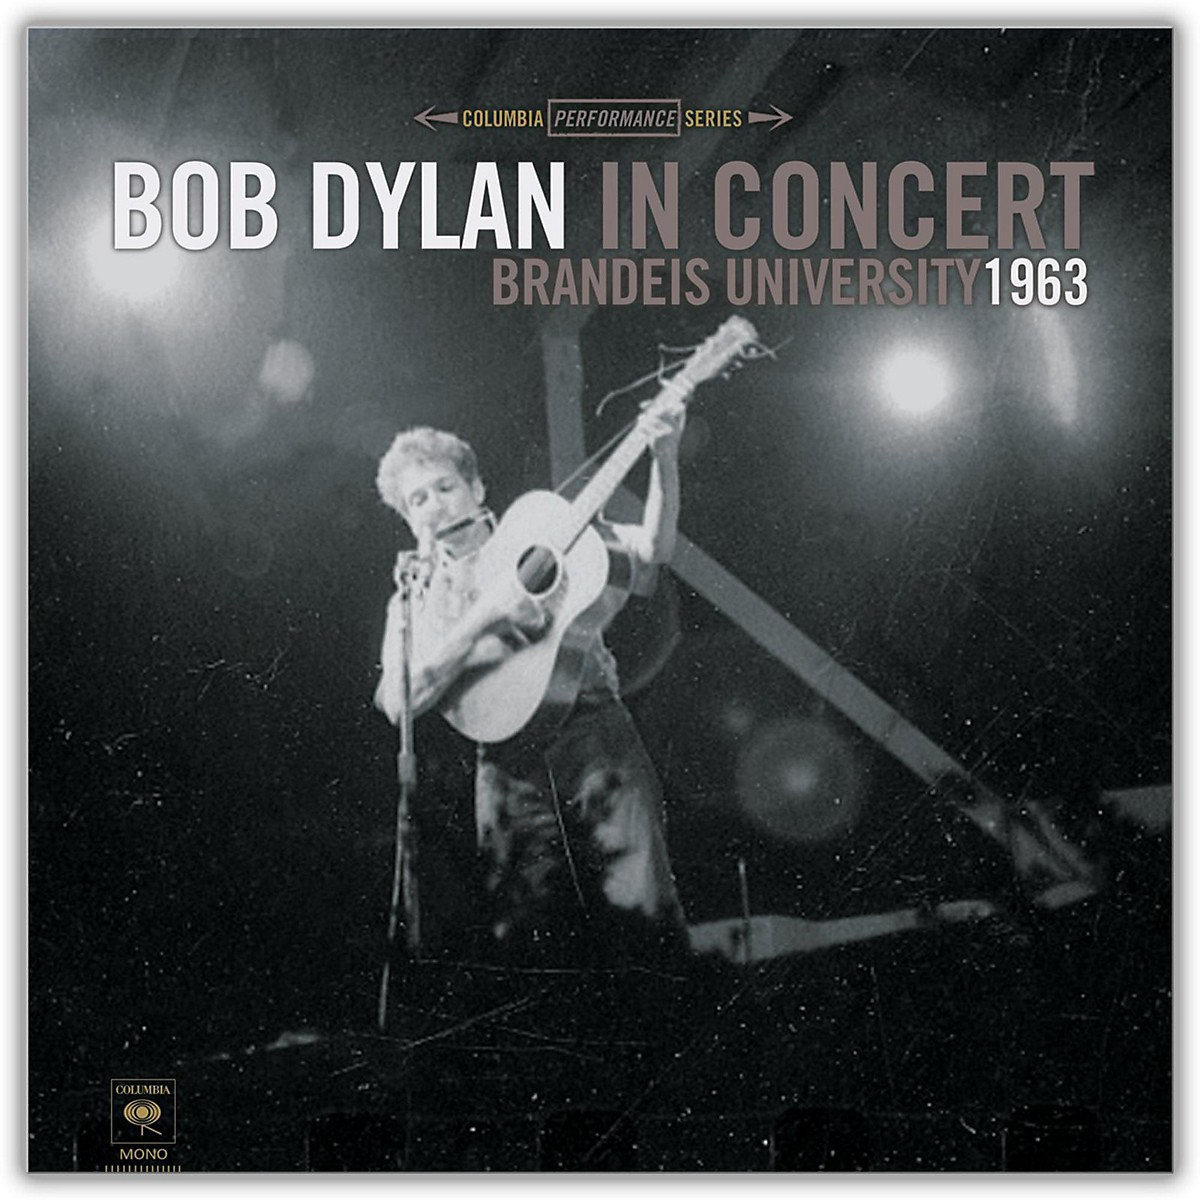 Sony Bob Dylan - In Concert - Brandeis University 1963 Vinyl LP